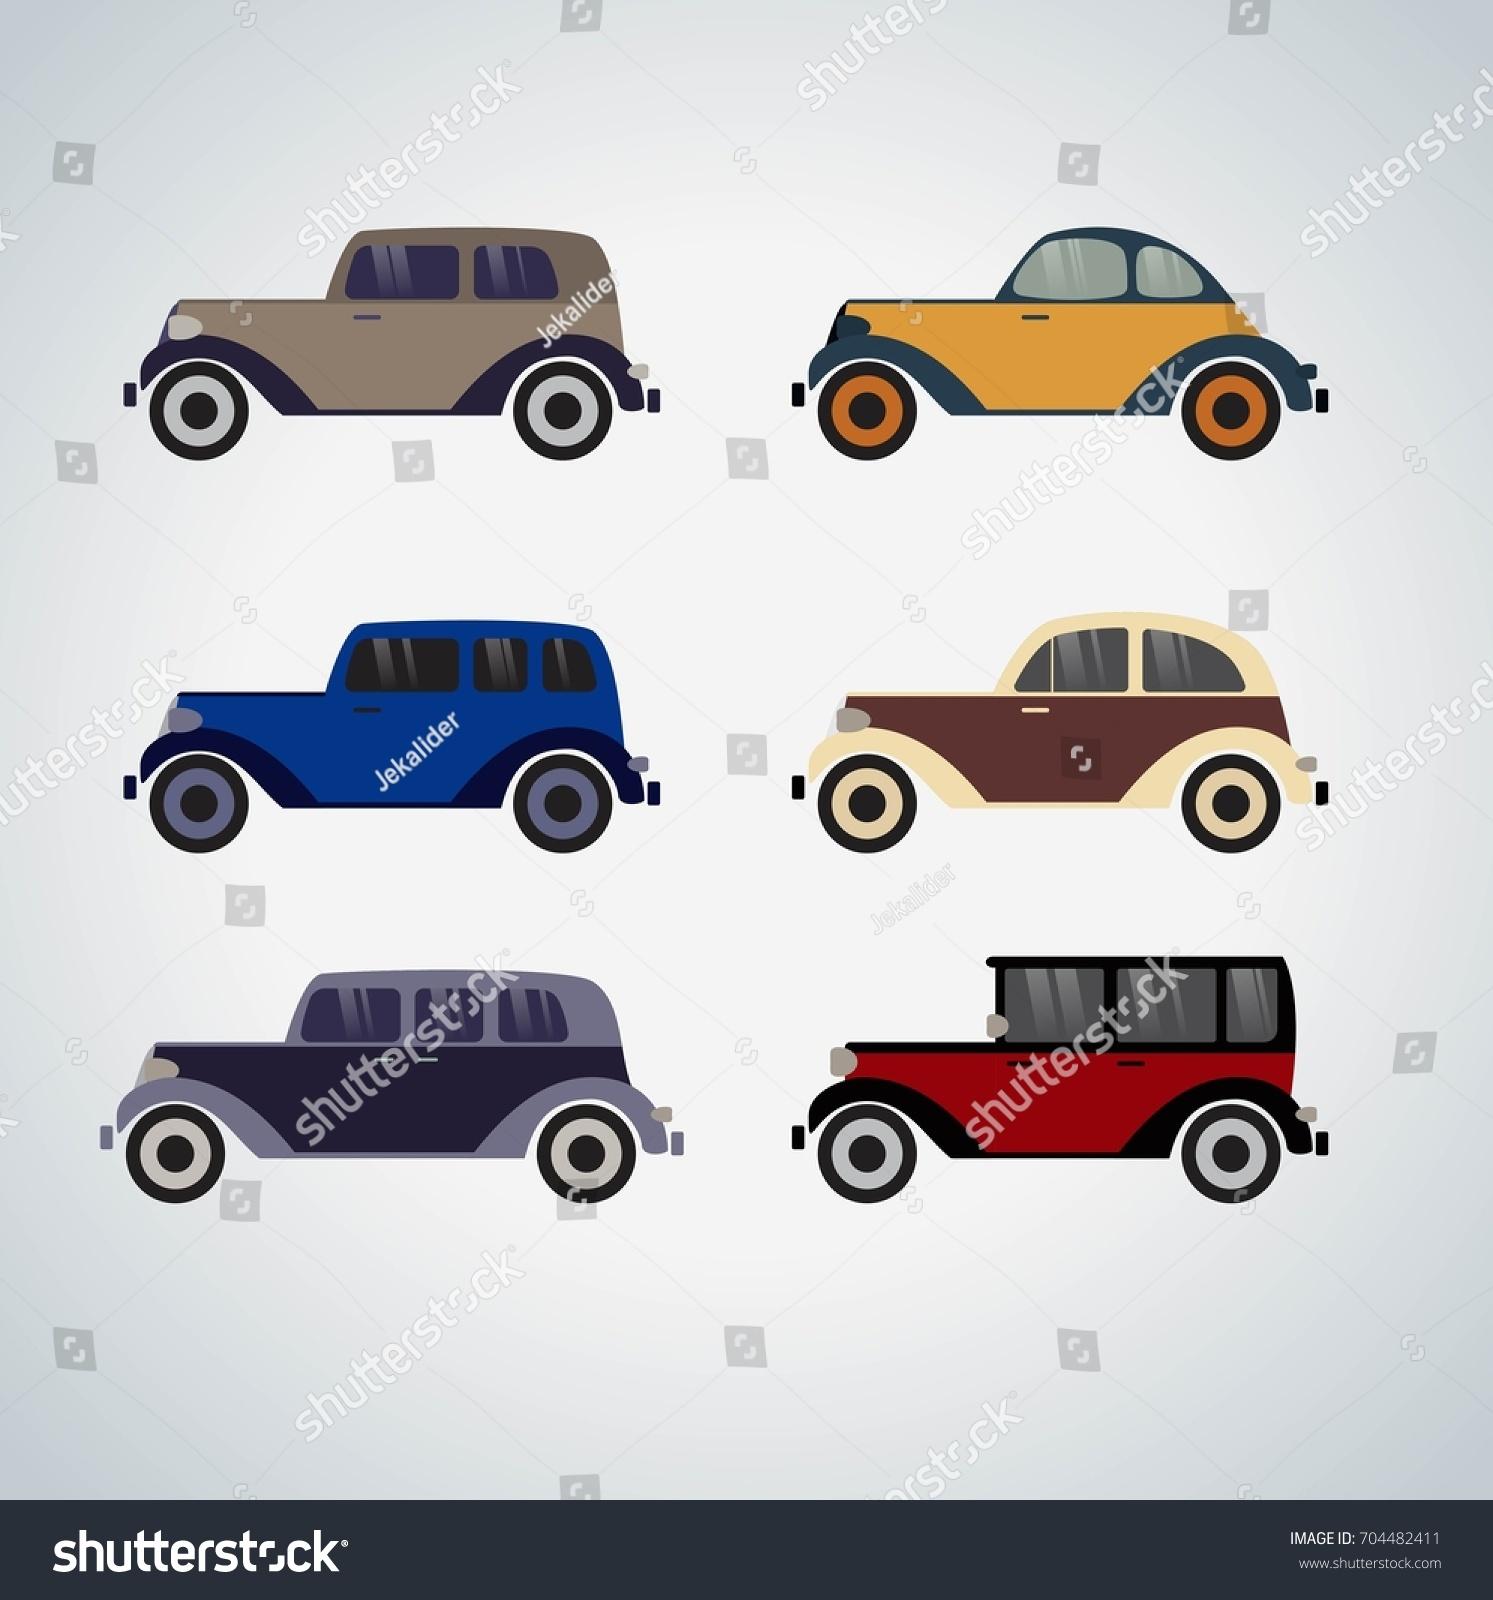 Vintage Cars Cartoon Sketch Vector Abstract Stock Vector 704482411 ...